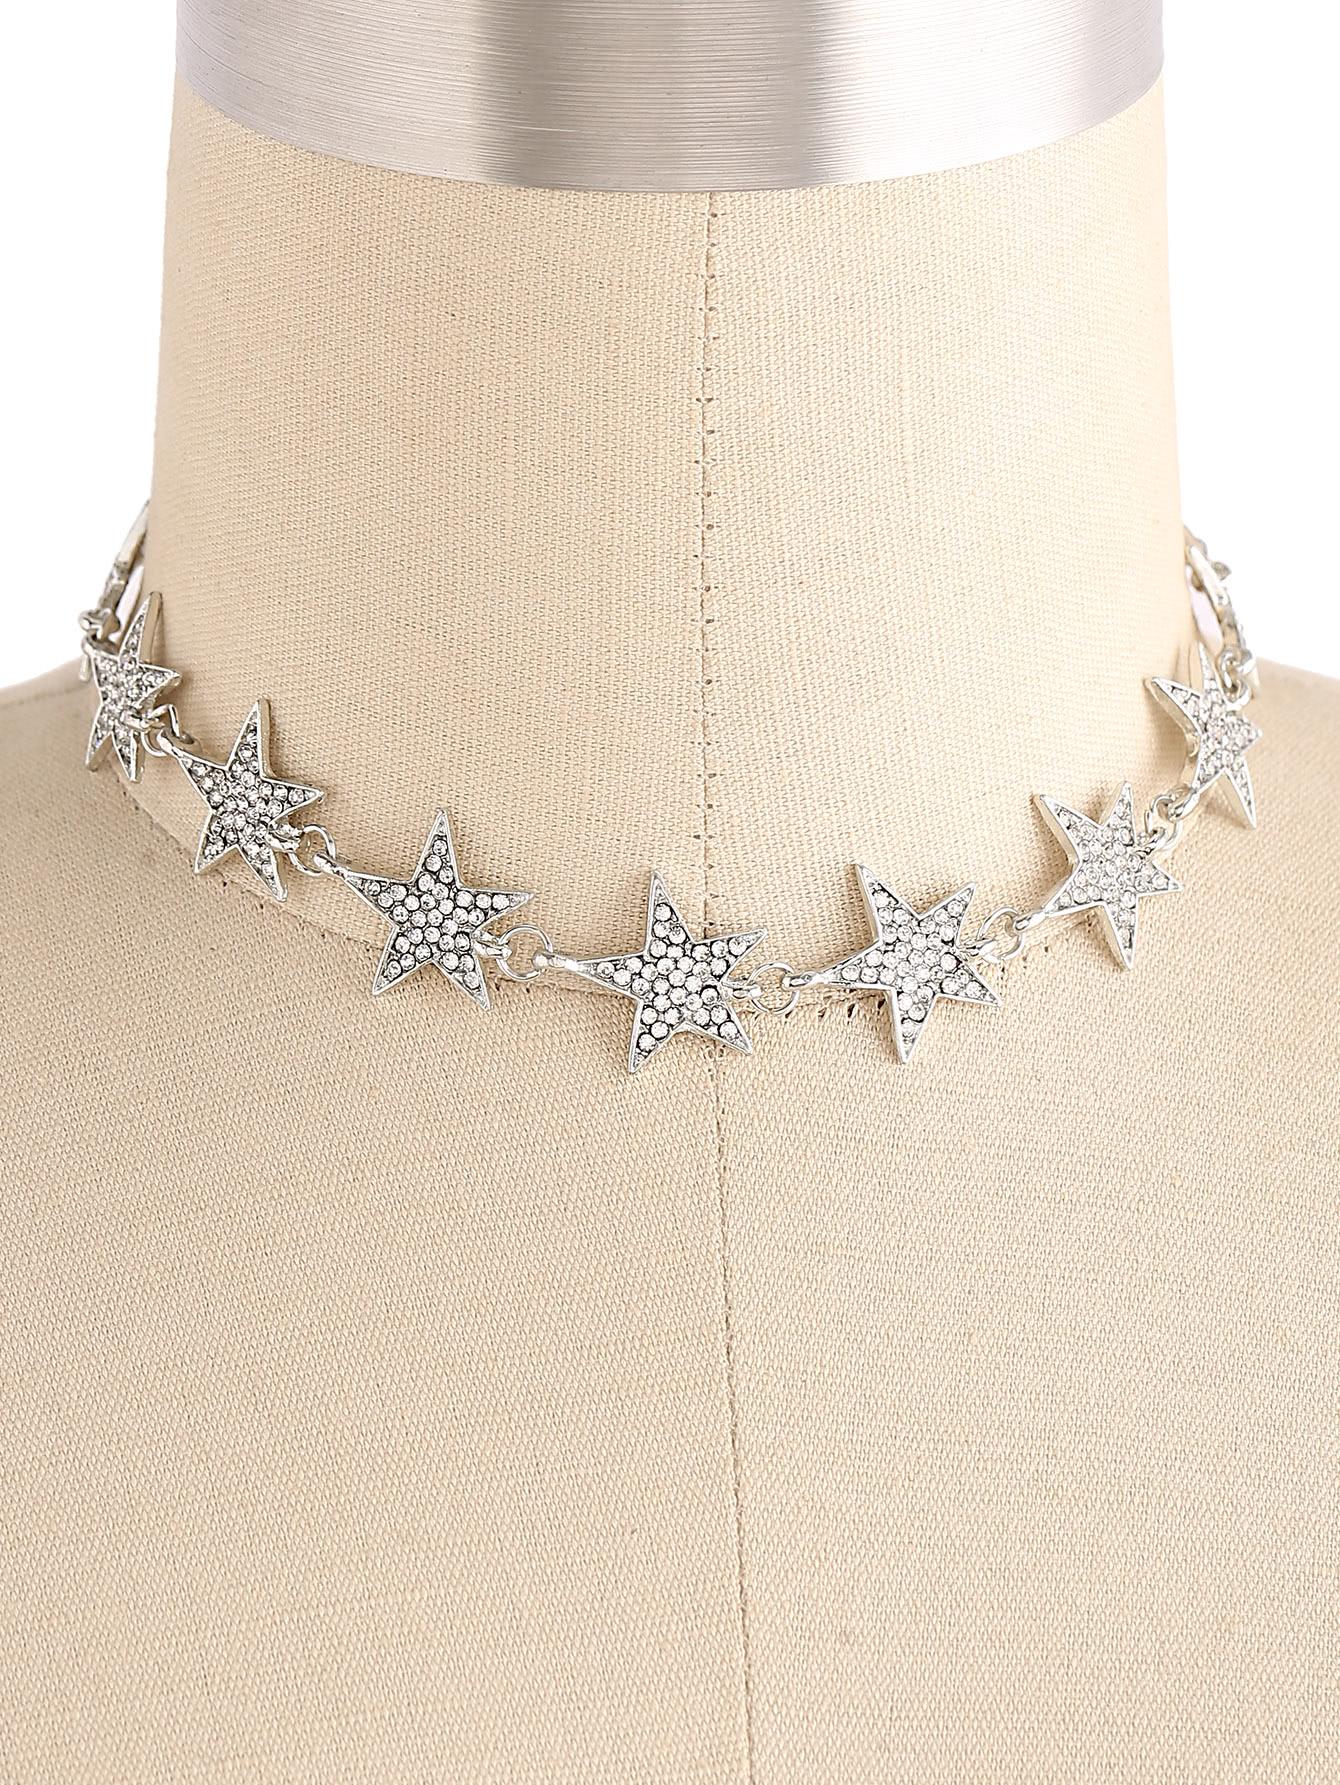 Rhinestone Embellished Star Design Choker 2pcs tiny rhinestone clover embellished hairpins